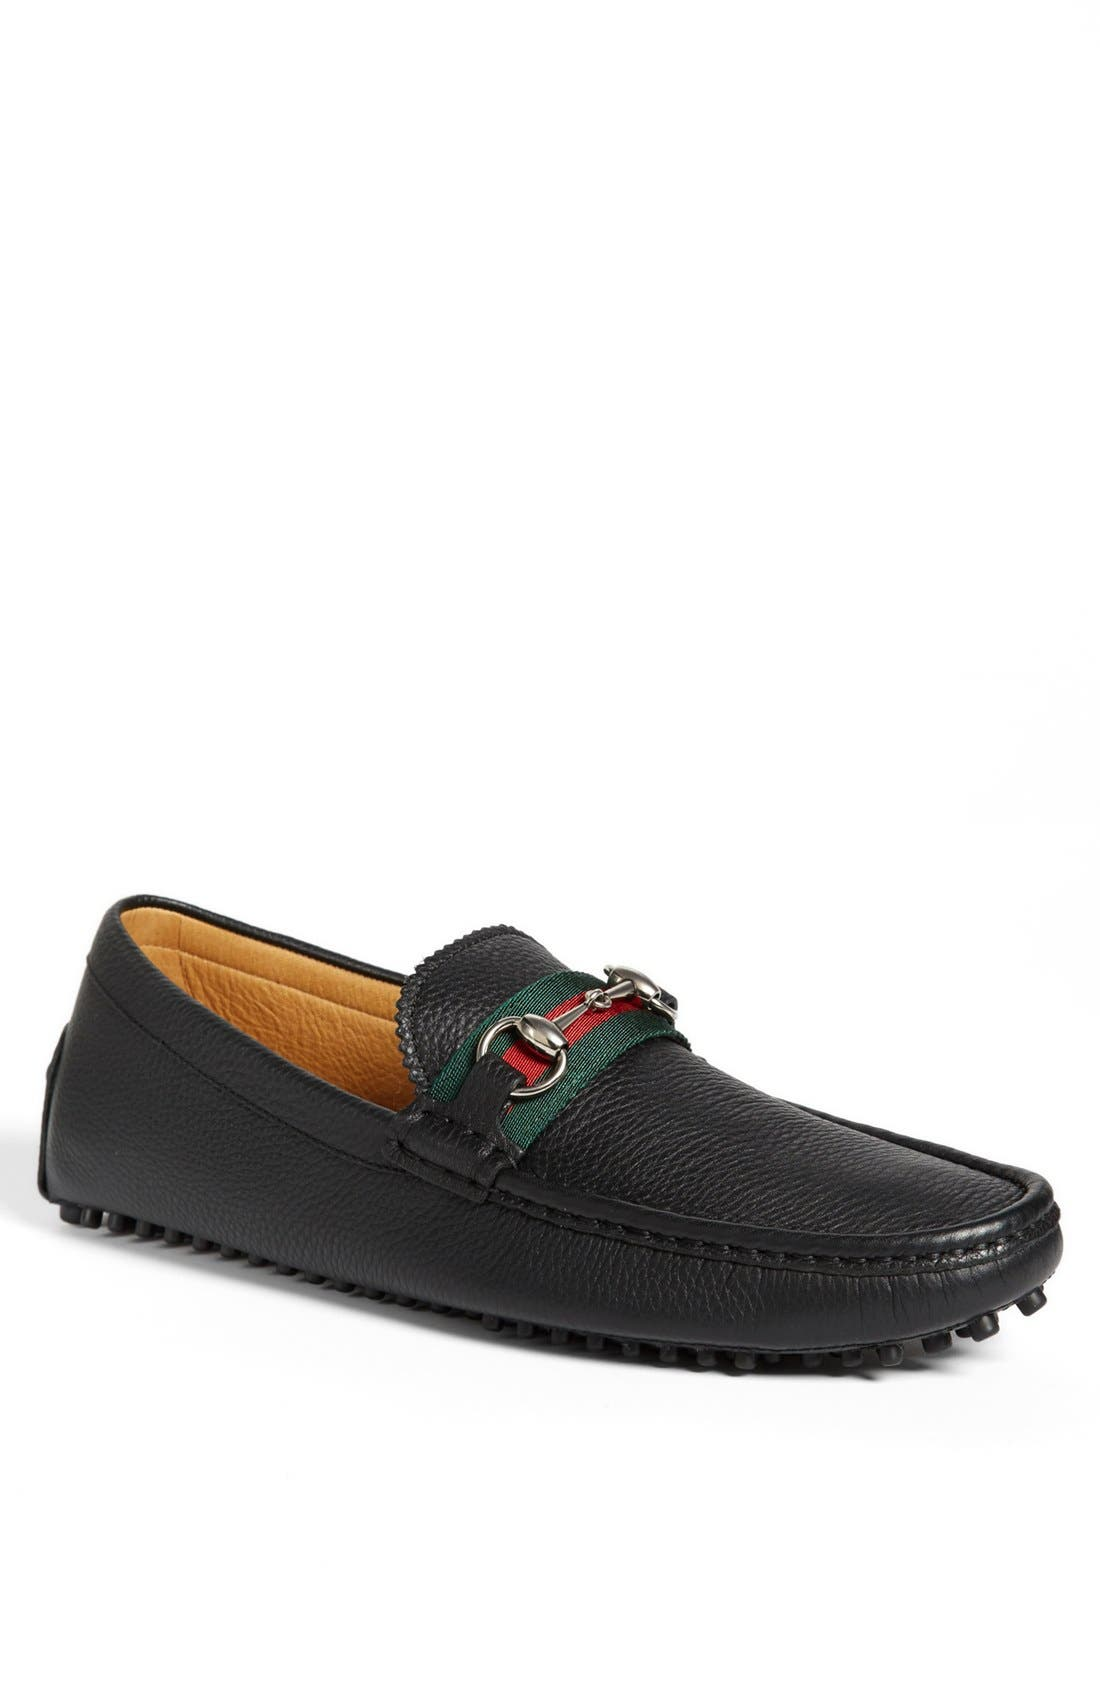 gucci shoes for men price. gucci \u0027damo\u0027 driving shoe (men) shoes for men price e